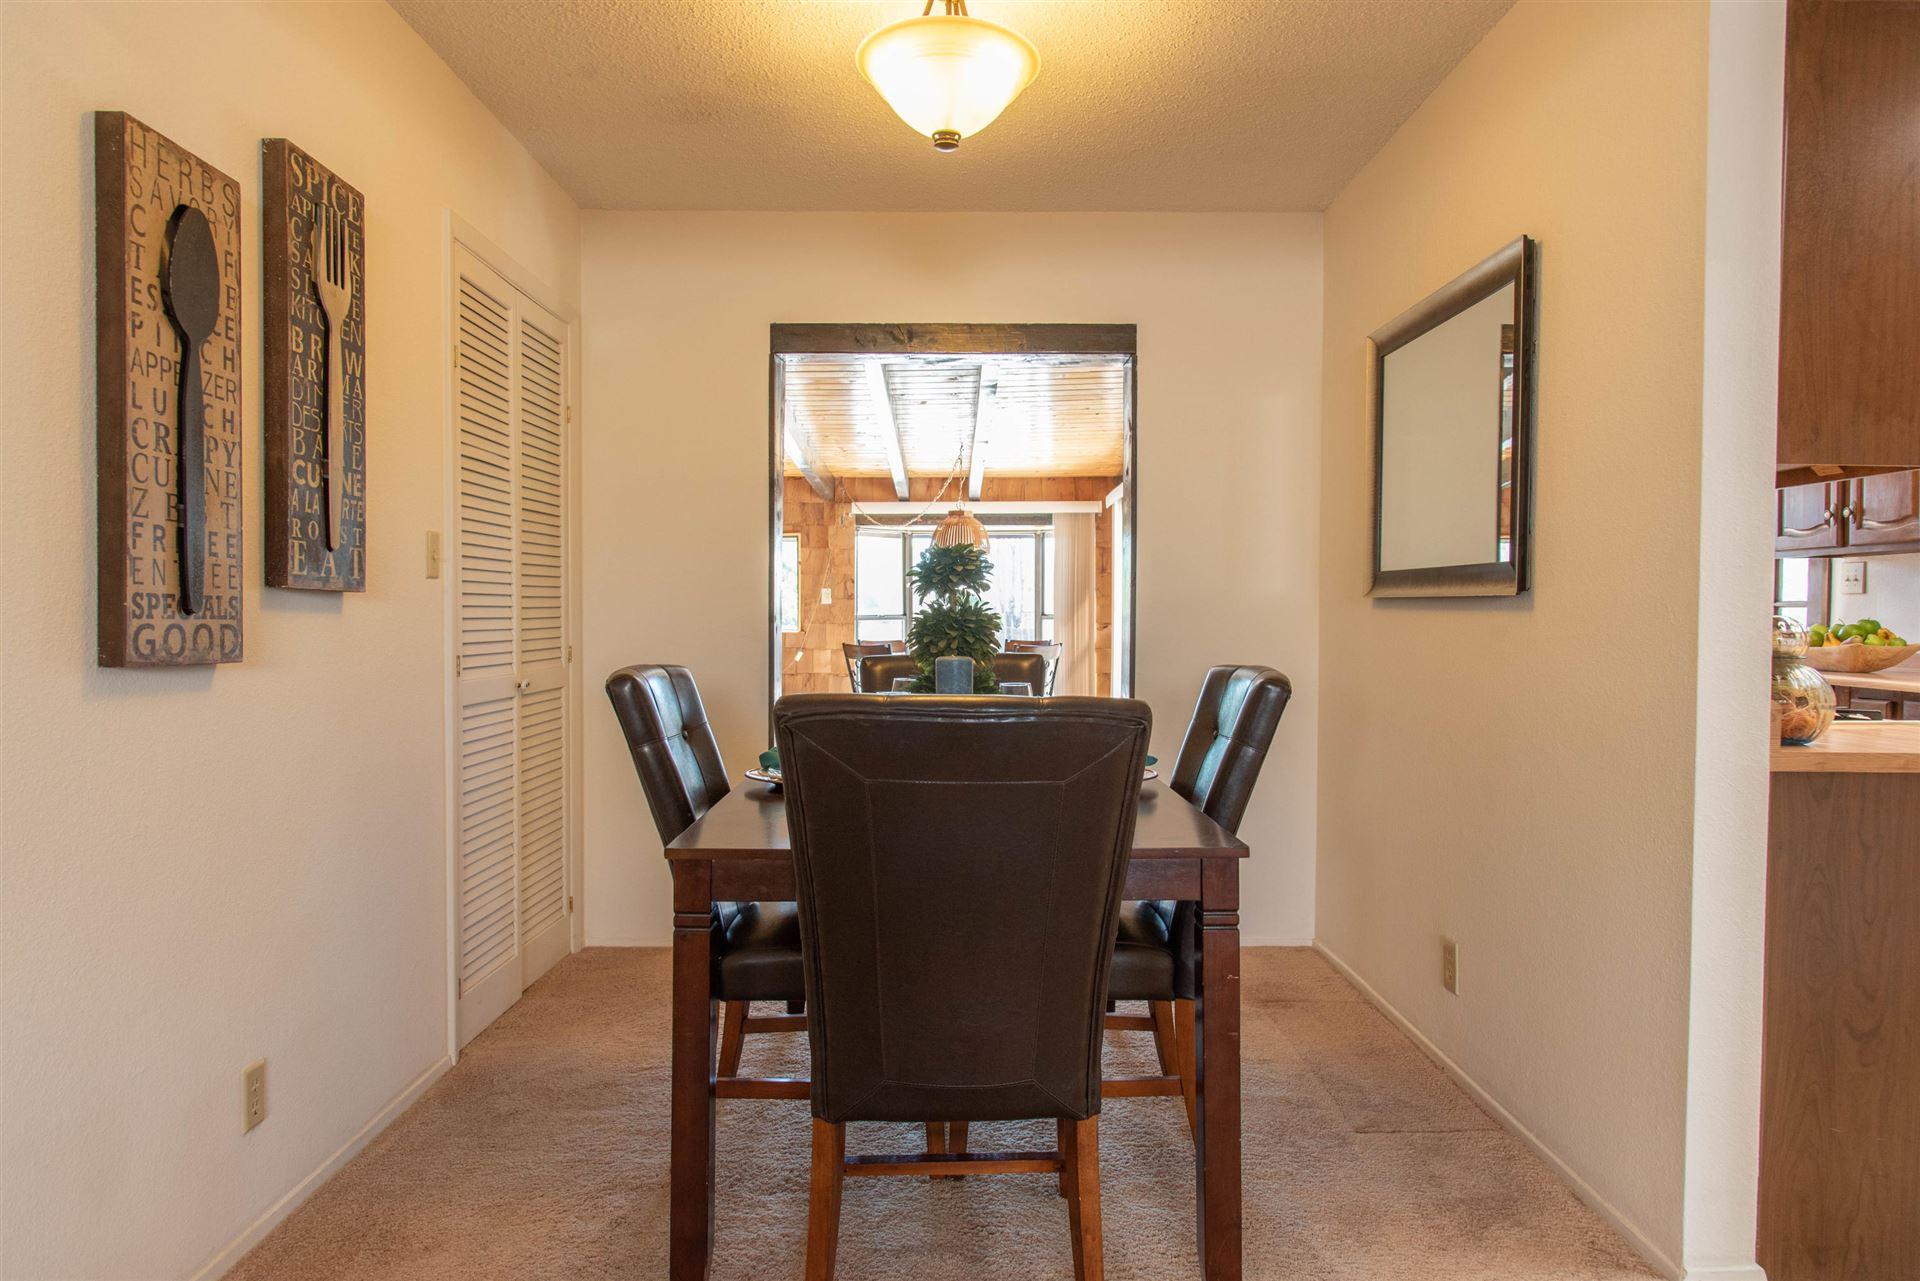 Photo of 806 La Casa De Prasa Drive SE, Rio Rancho, NM 87124 (MLS # 989487)